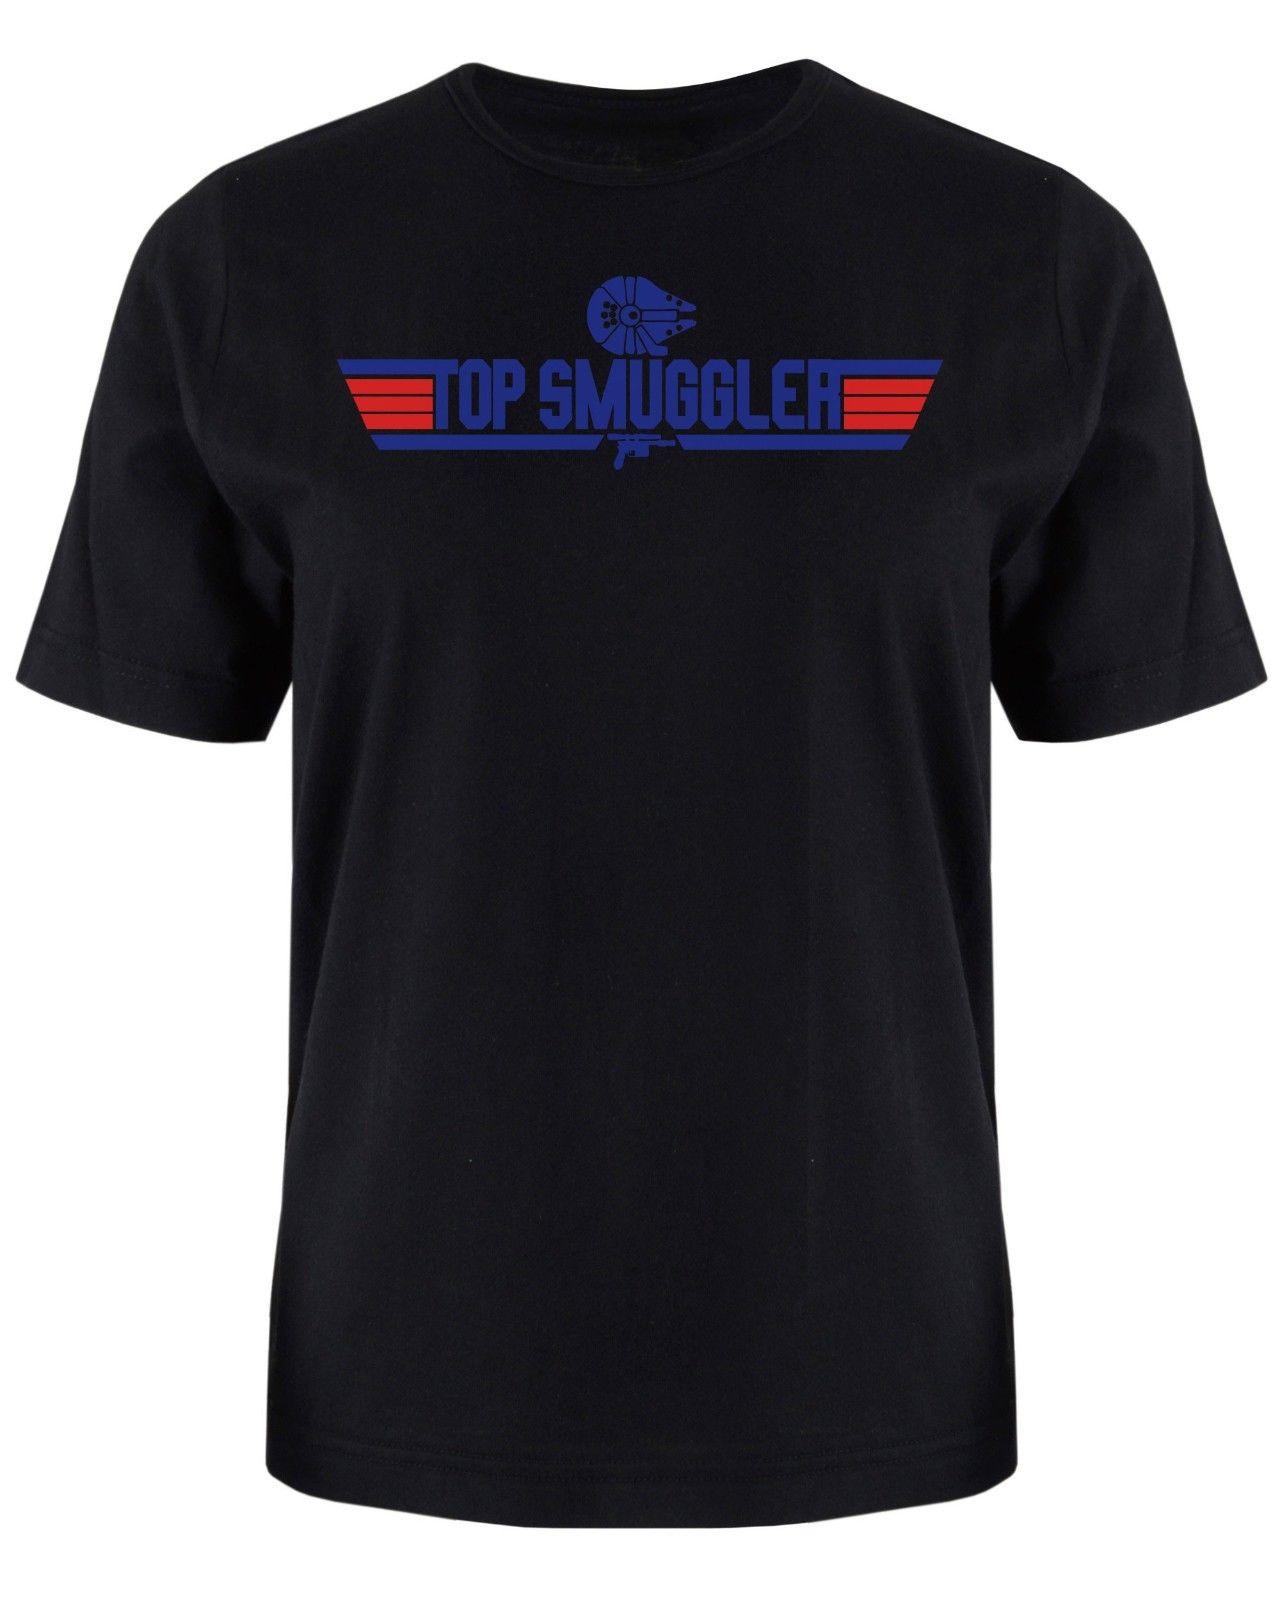 Top Smuggler Han Solo T Shirt Star Wars Inspired Men 39 s Tee Shirt Free shipping Harajuku Tops Fashion Classic Unique in T Shirts from Men 39 s Clothing